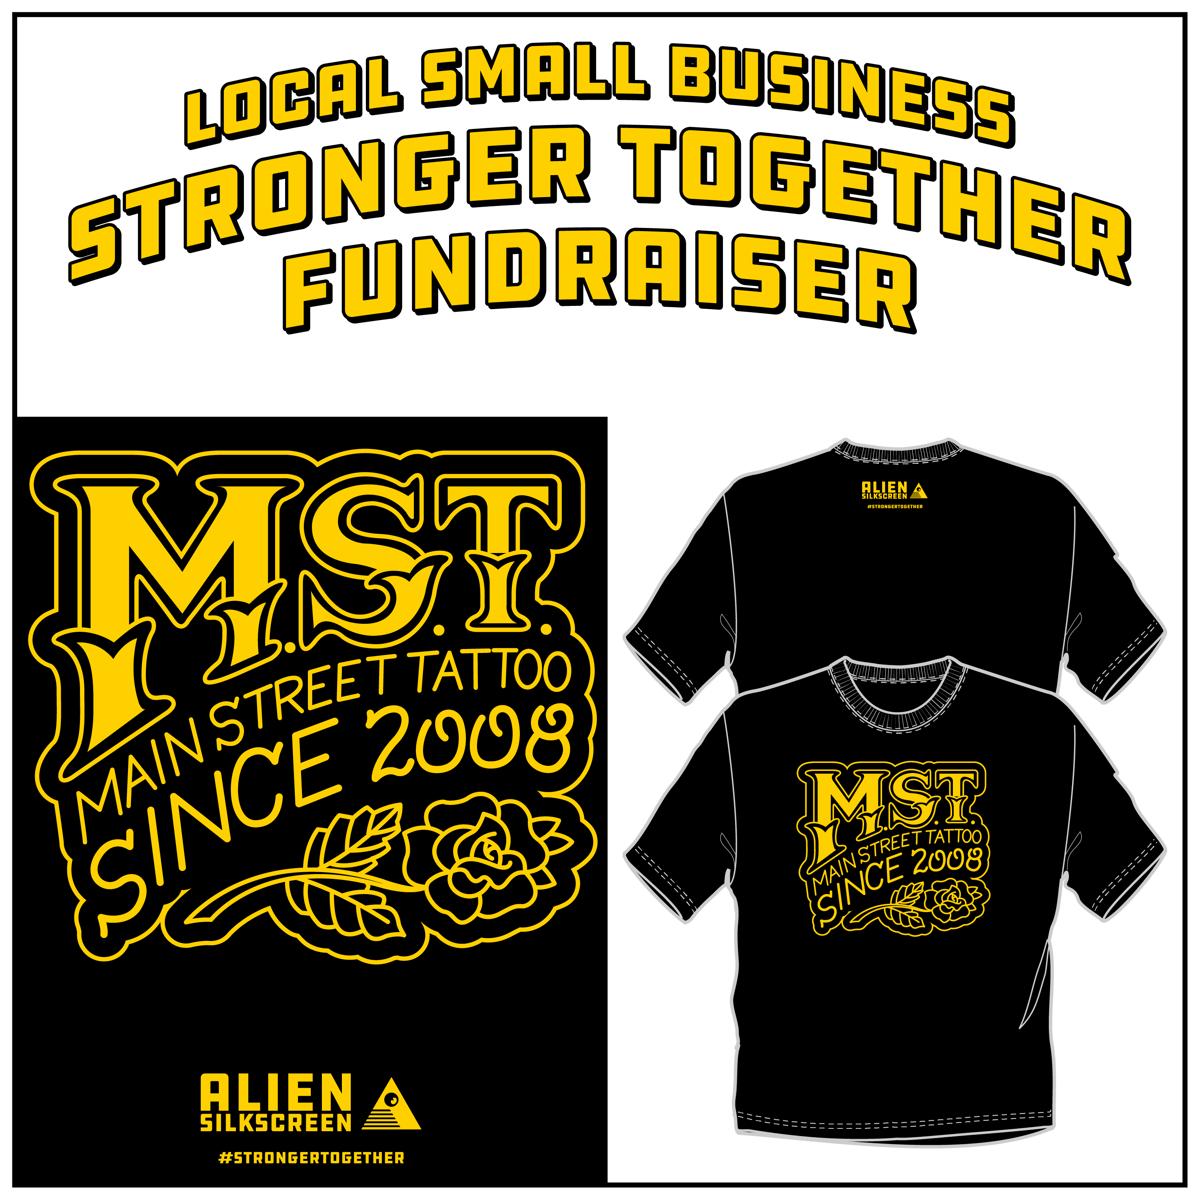 Main Street Tattoo Stronger Together Fundraiser